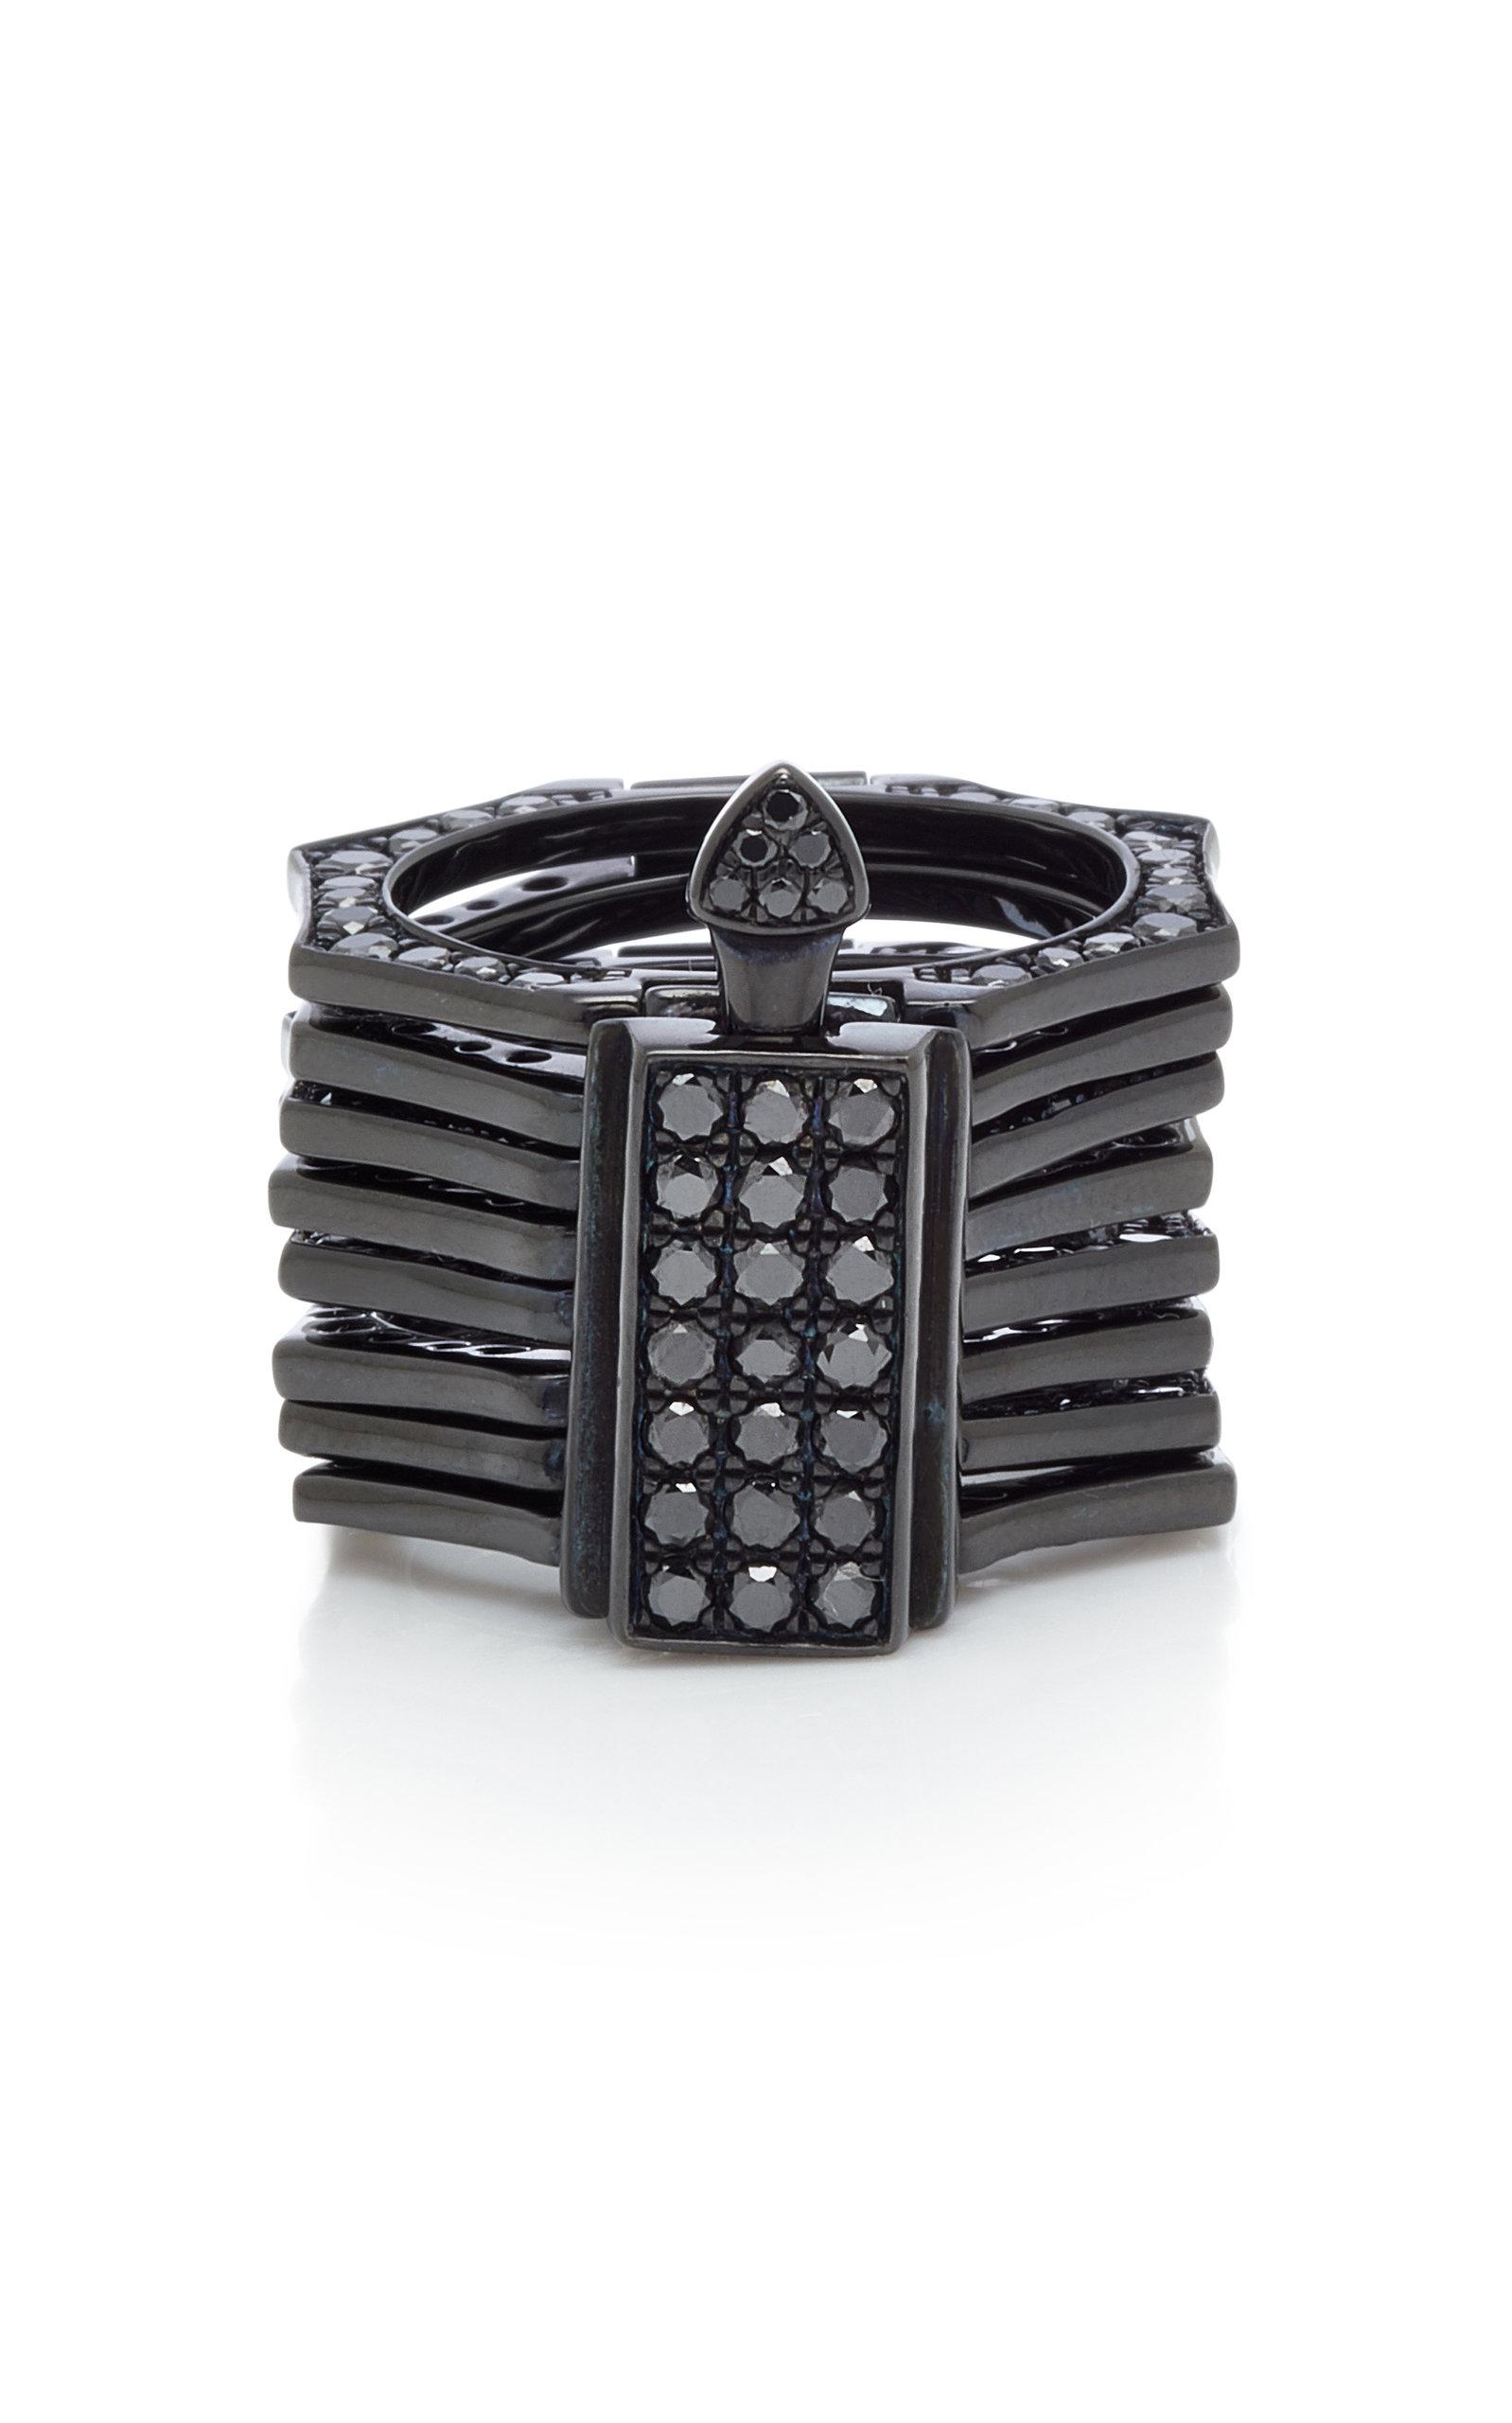 LYNN BAN JEWELRY Reverso Rhodium And Black Diamond Convertible Ring